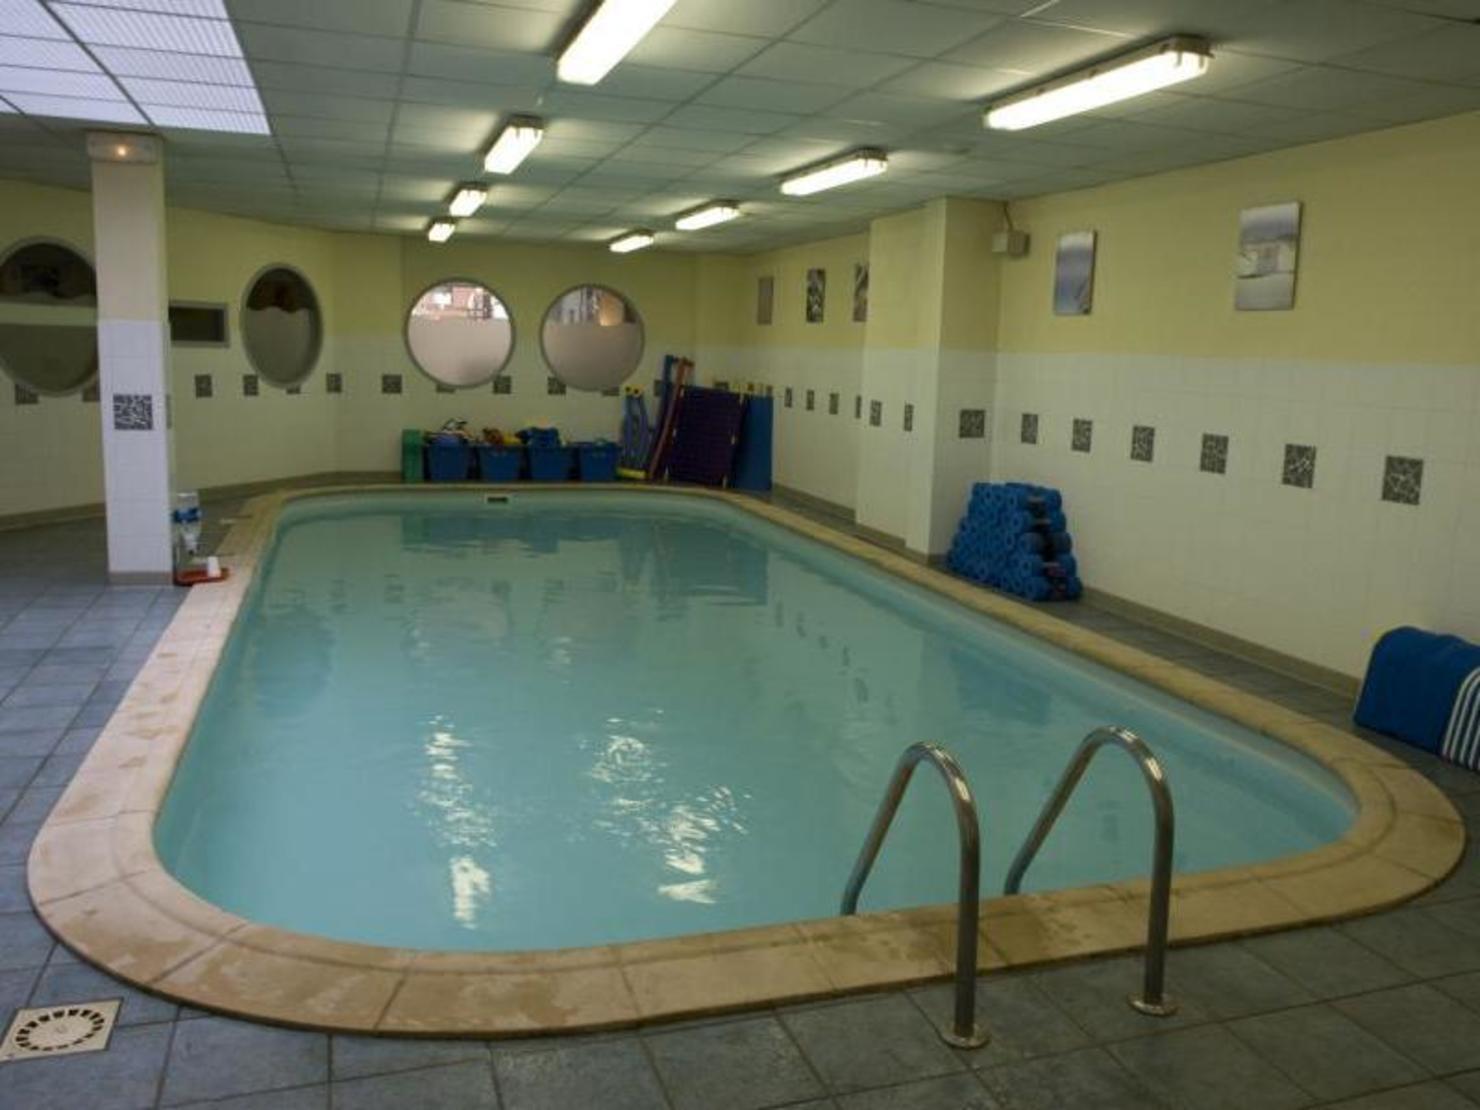 Movida club arcole toulouse tarifs avis horaires for Tarif piscine toulouse